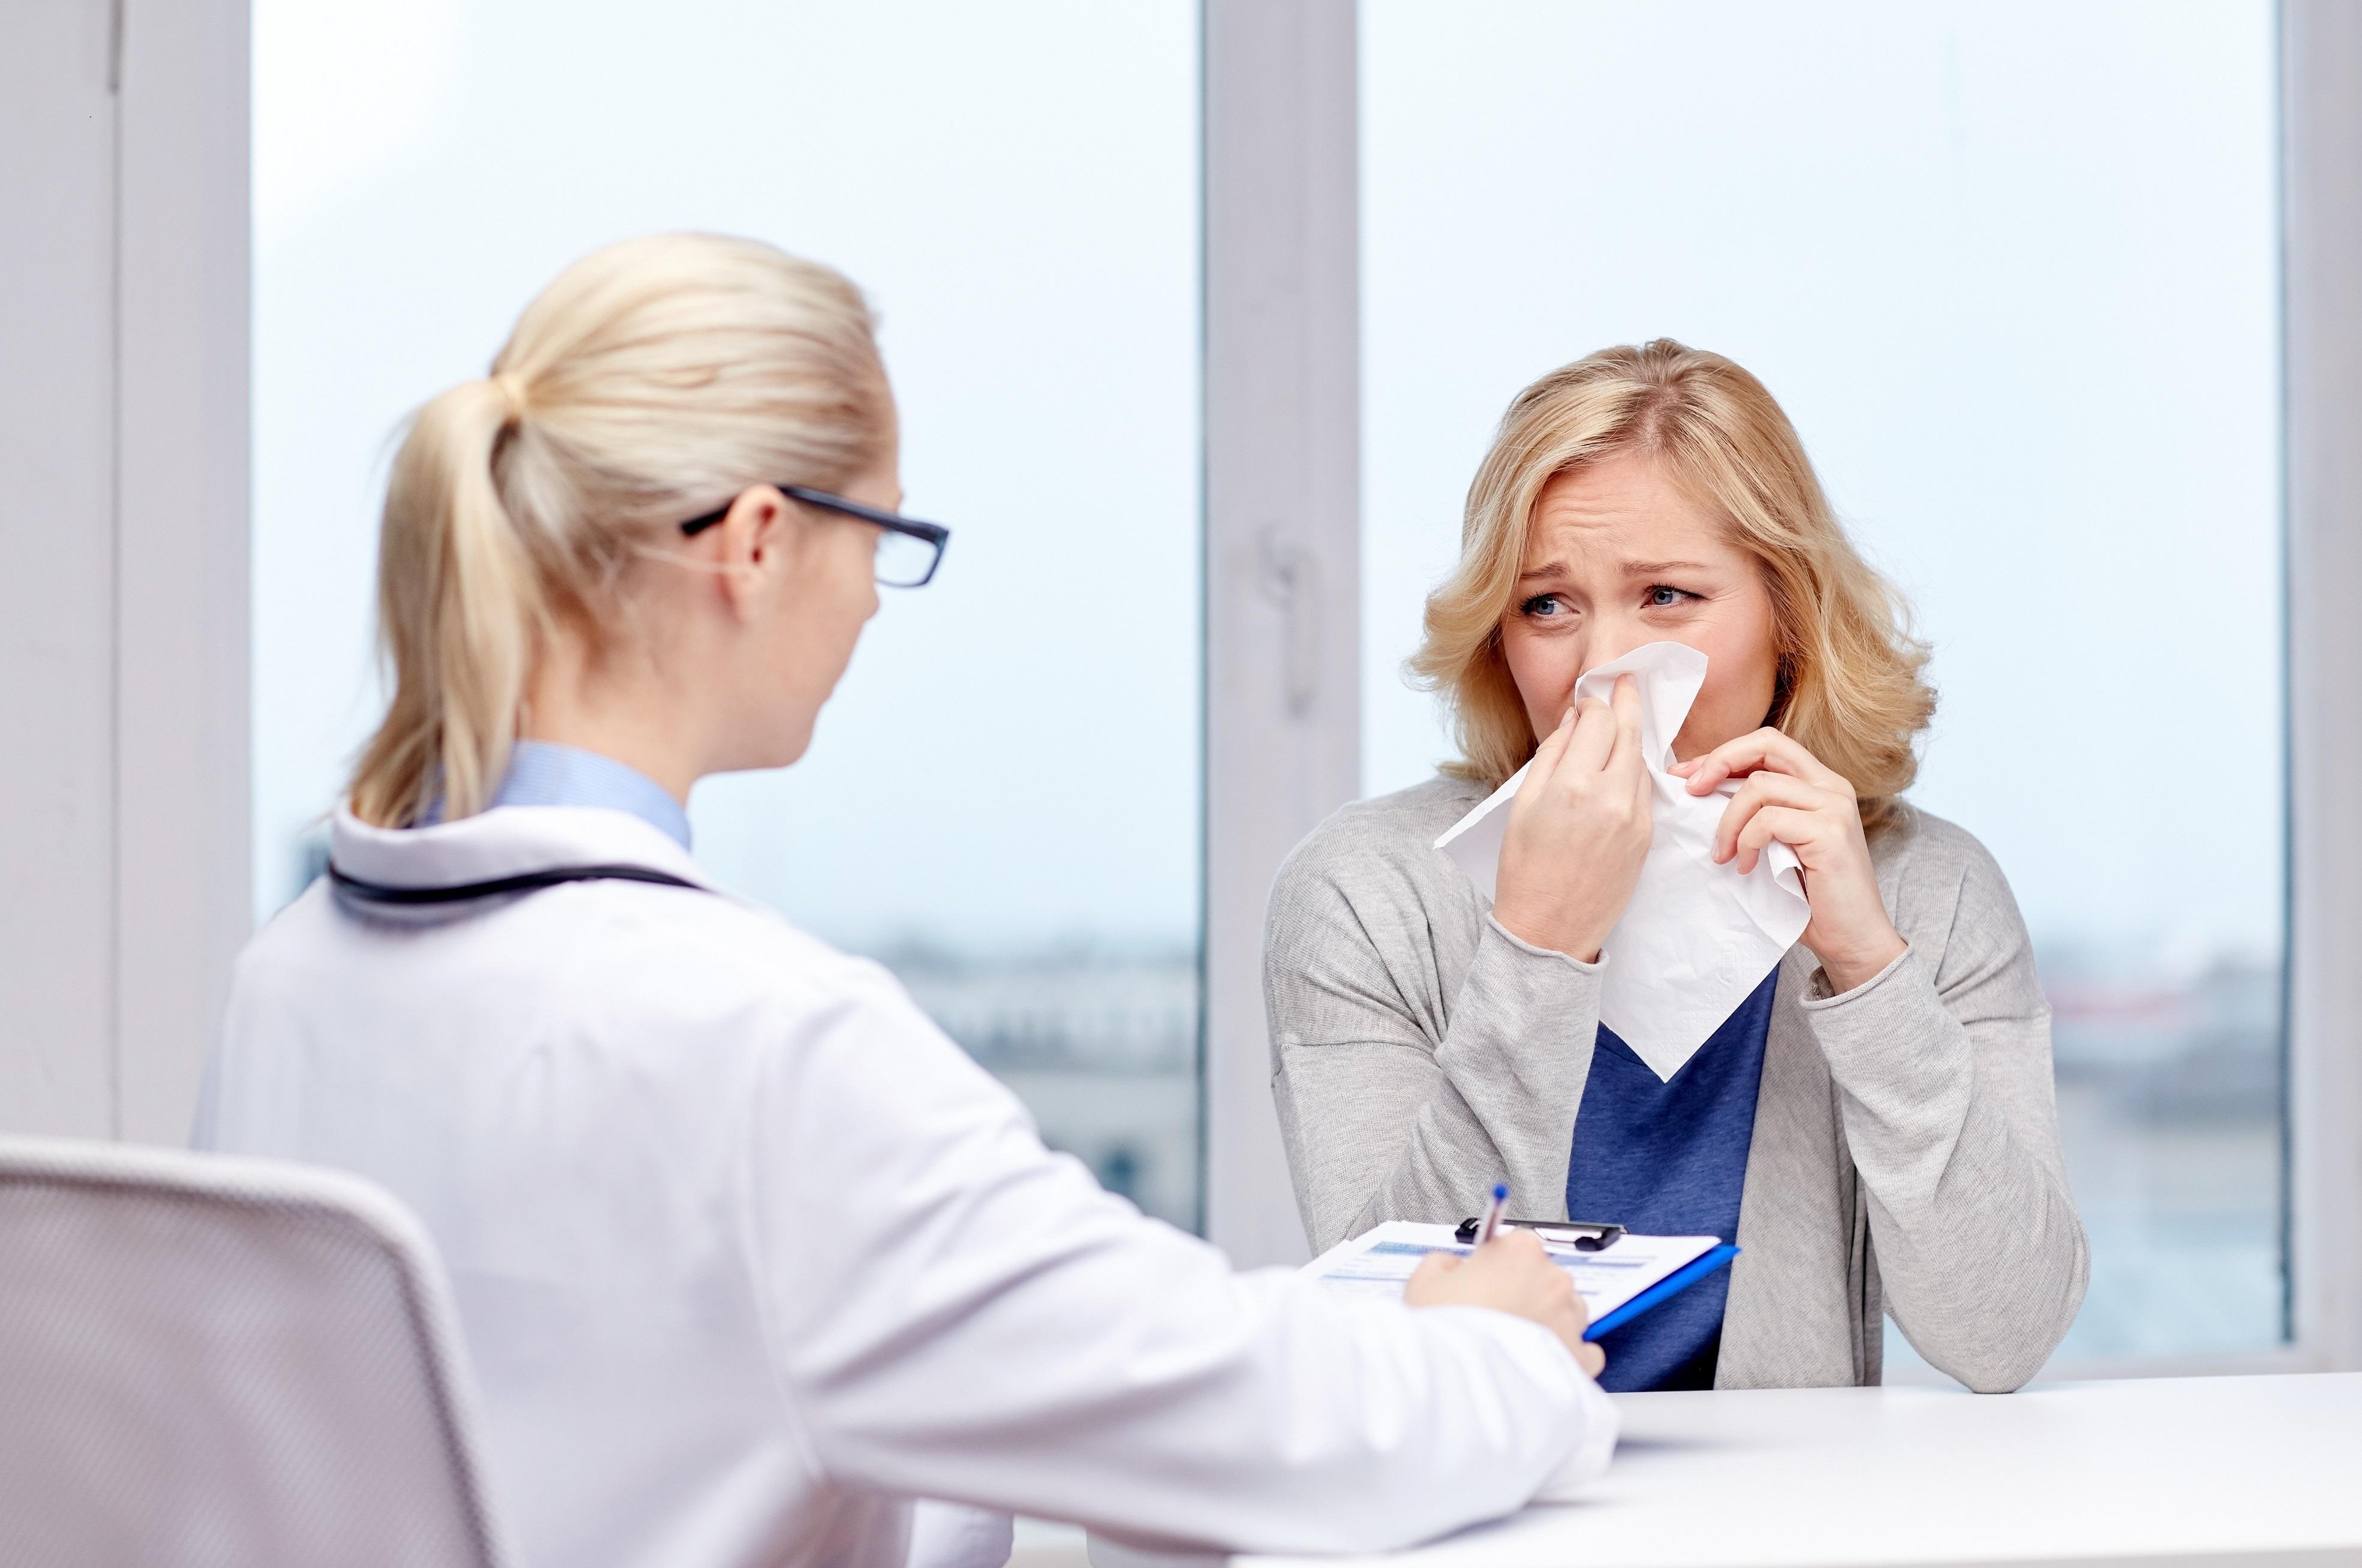 Erkältung Trotz Antibiotika Nicht Weg